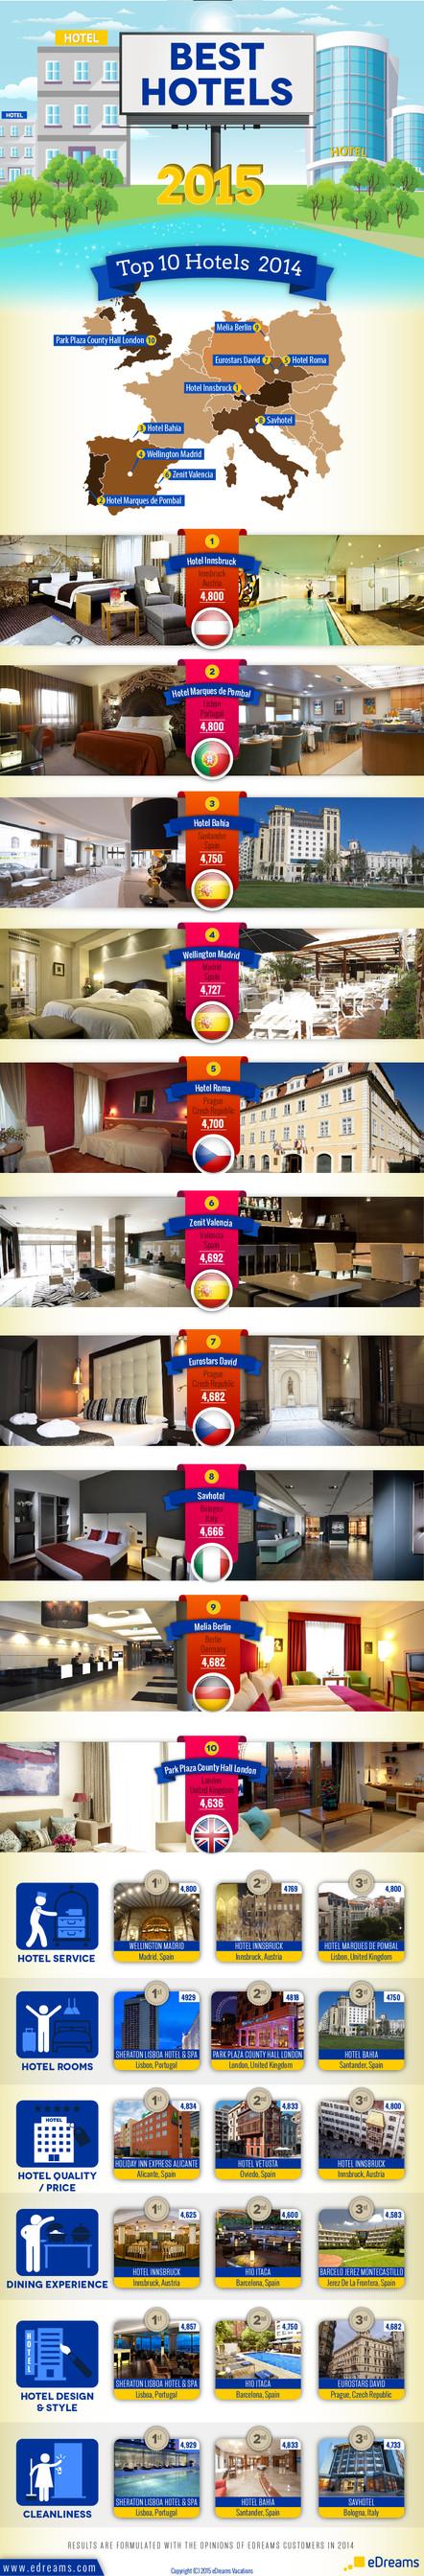 Best Hotels 2015